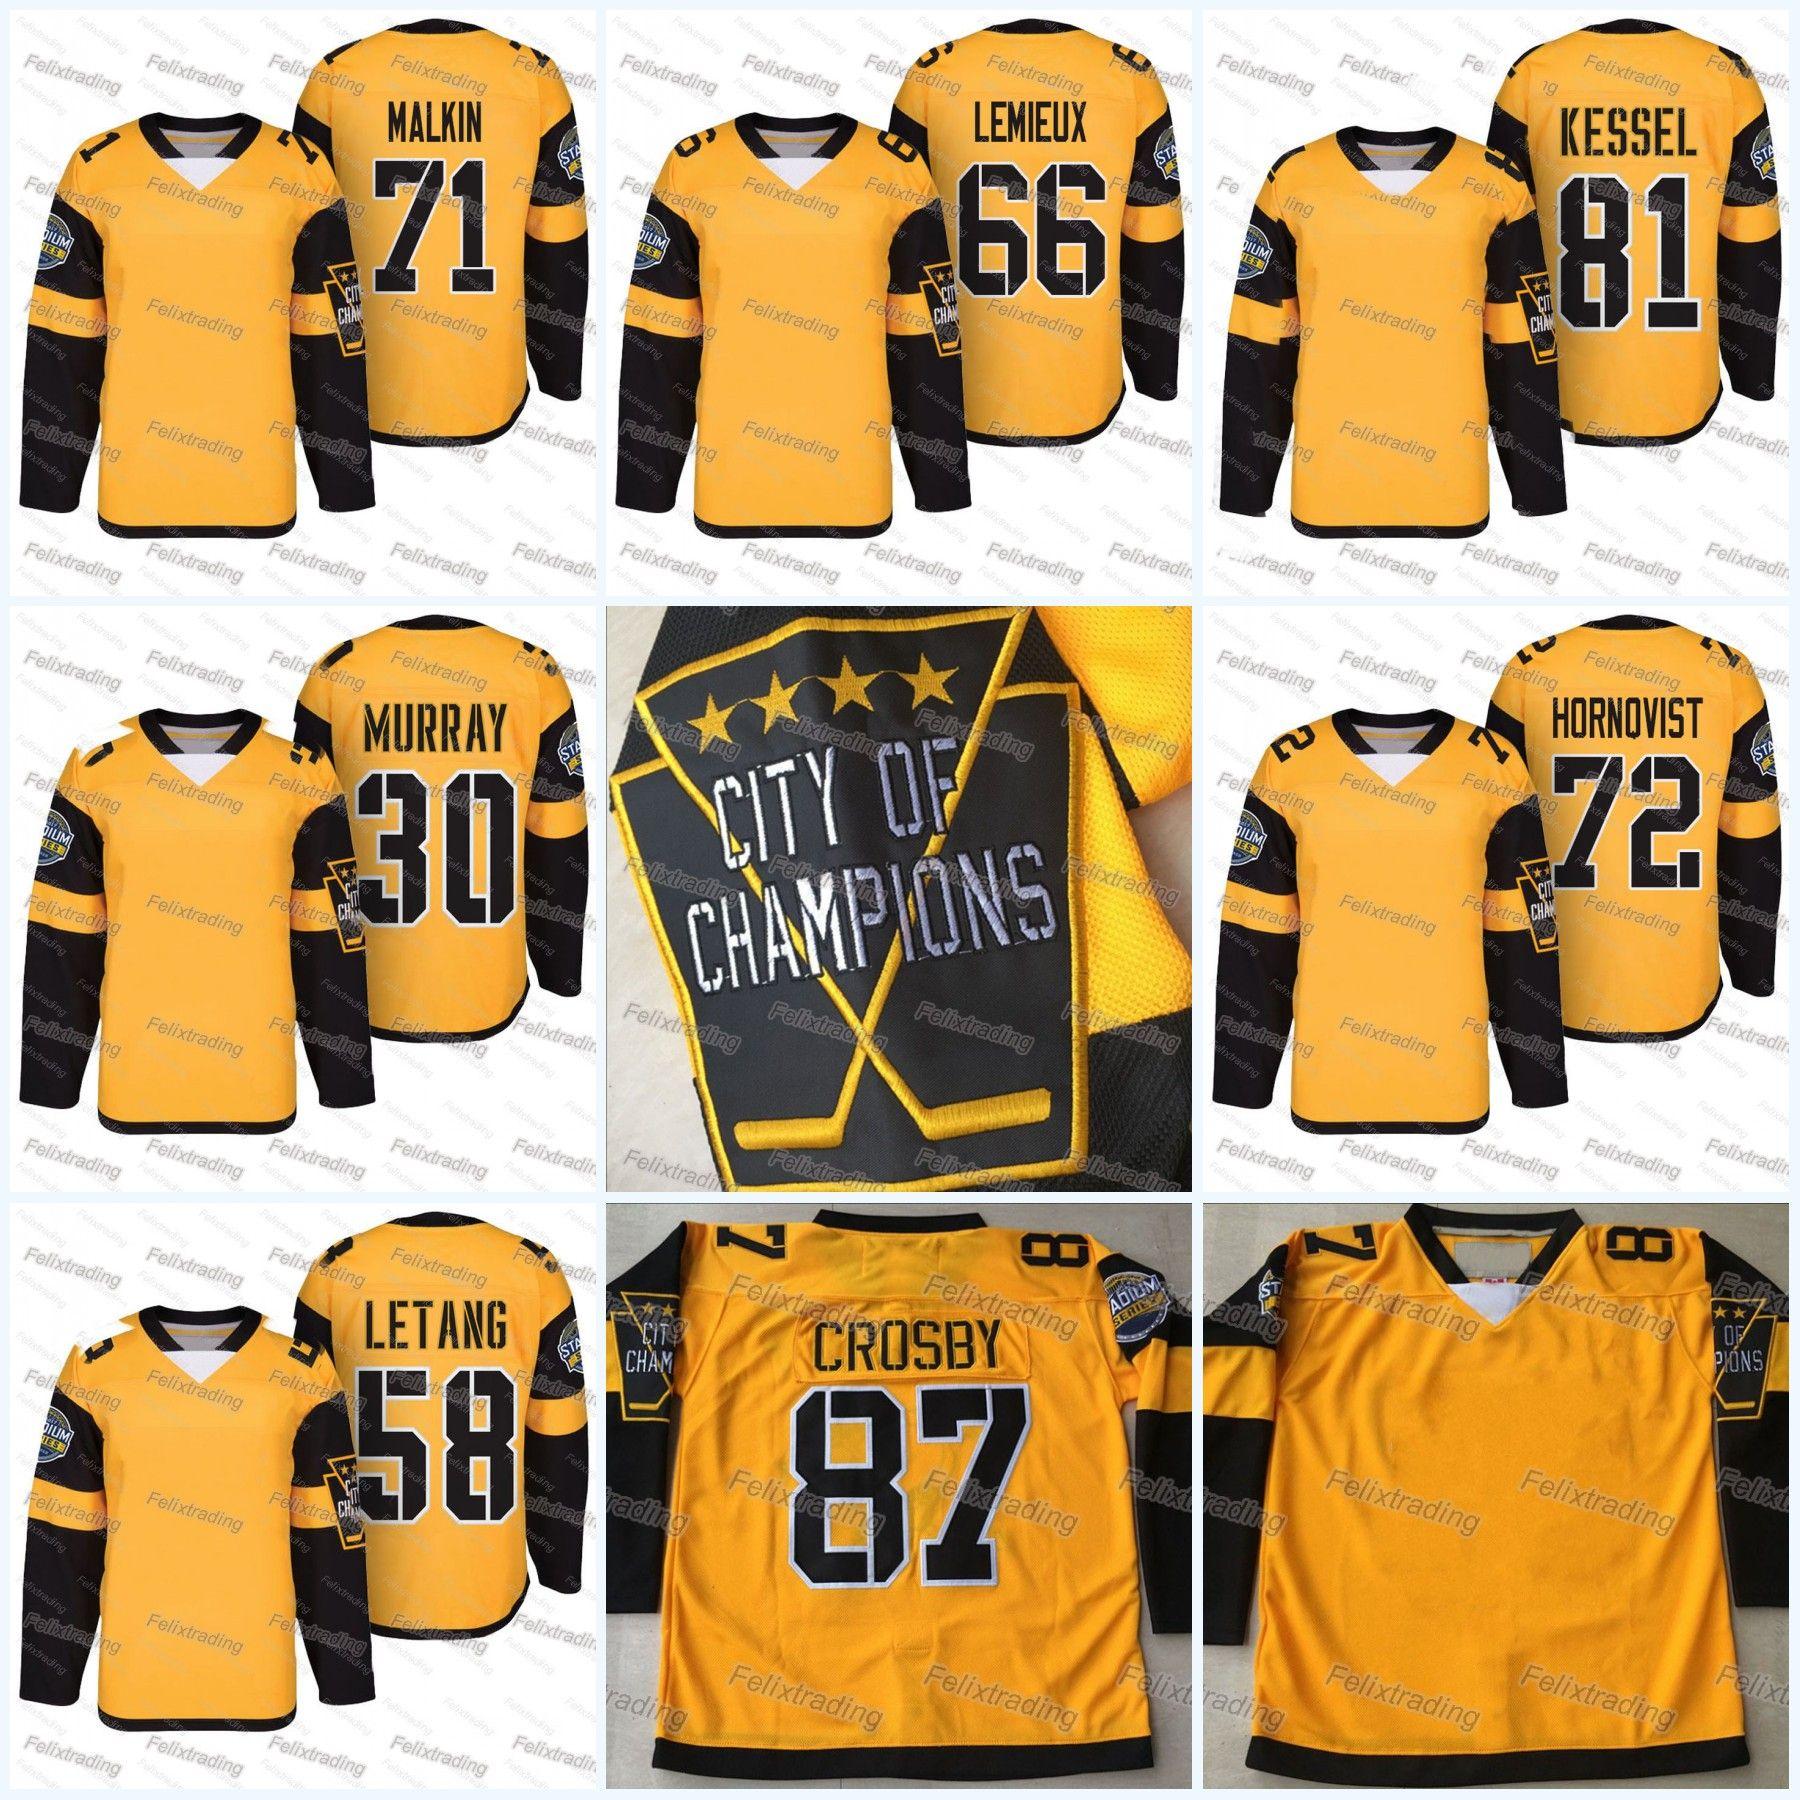 best website 4d519 72593 2017 Stadium Series #87 Sidney Crosby 30 Matt Murray 58 Kris Letang 81 Phil  Kessel 66 Mario Lemieux 68 Jaromir Jagr Hockey Jerseys